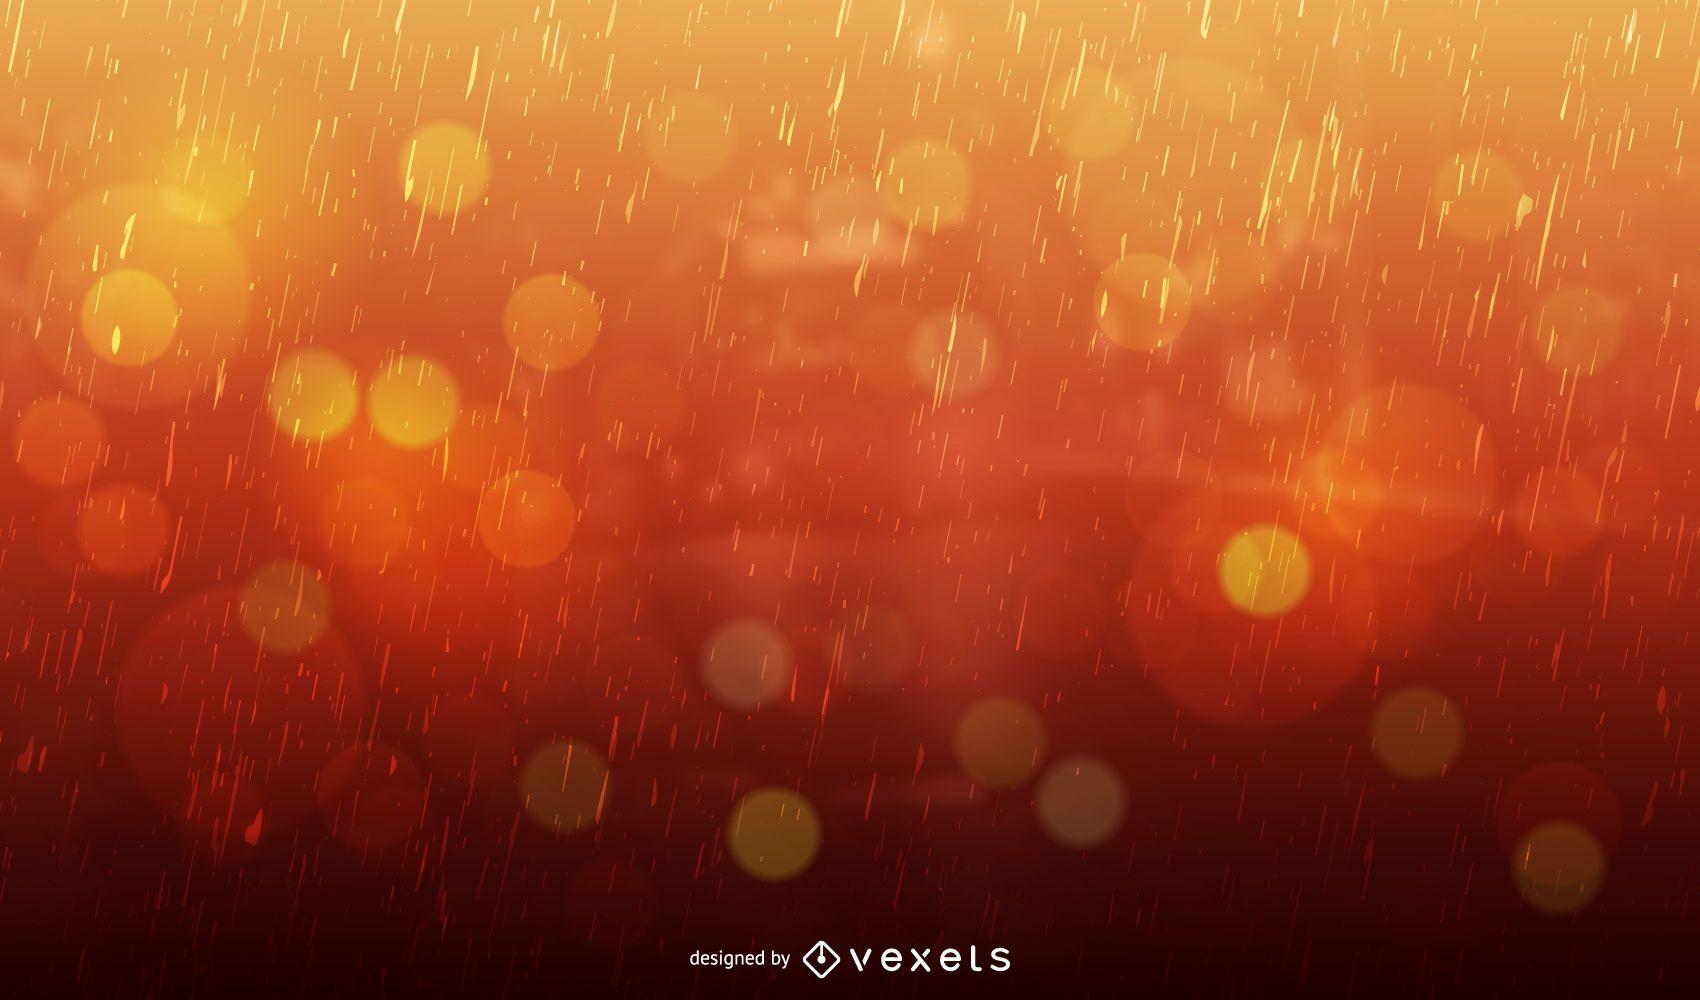 Bokeh backgroun with rain